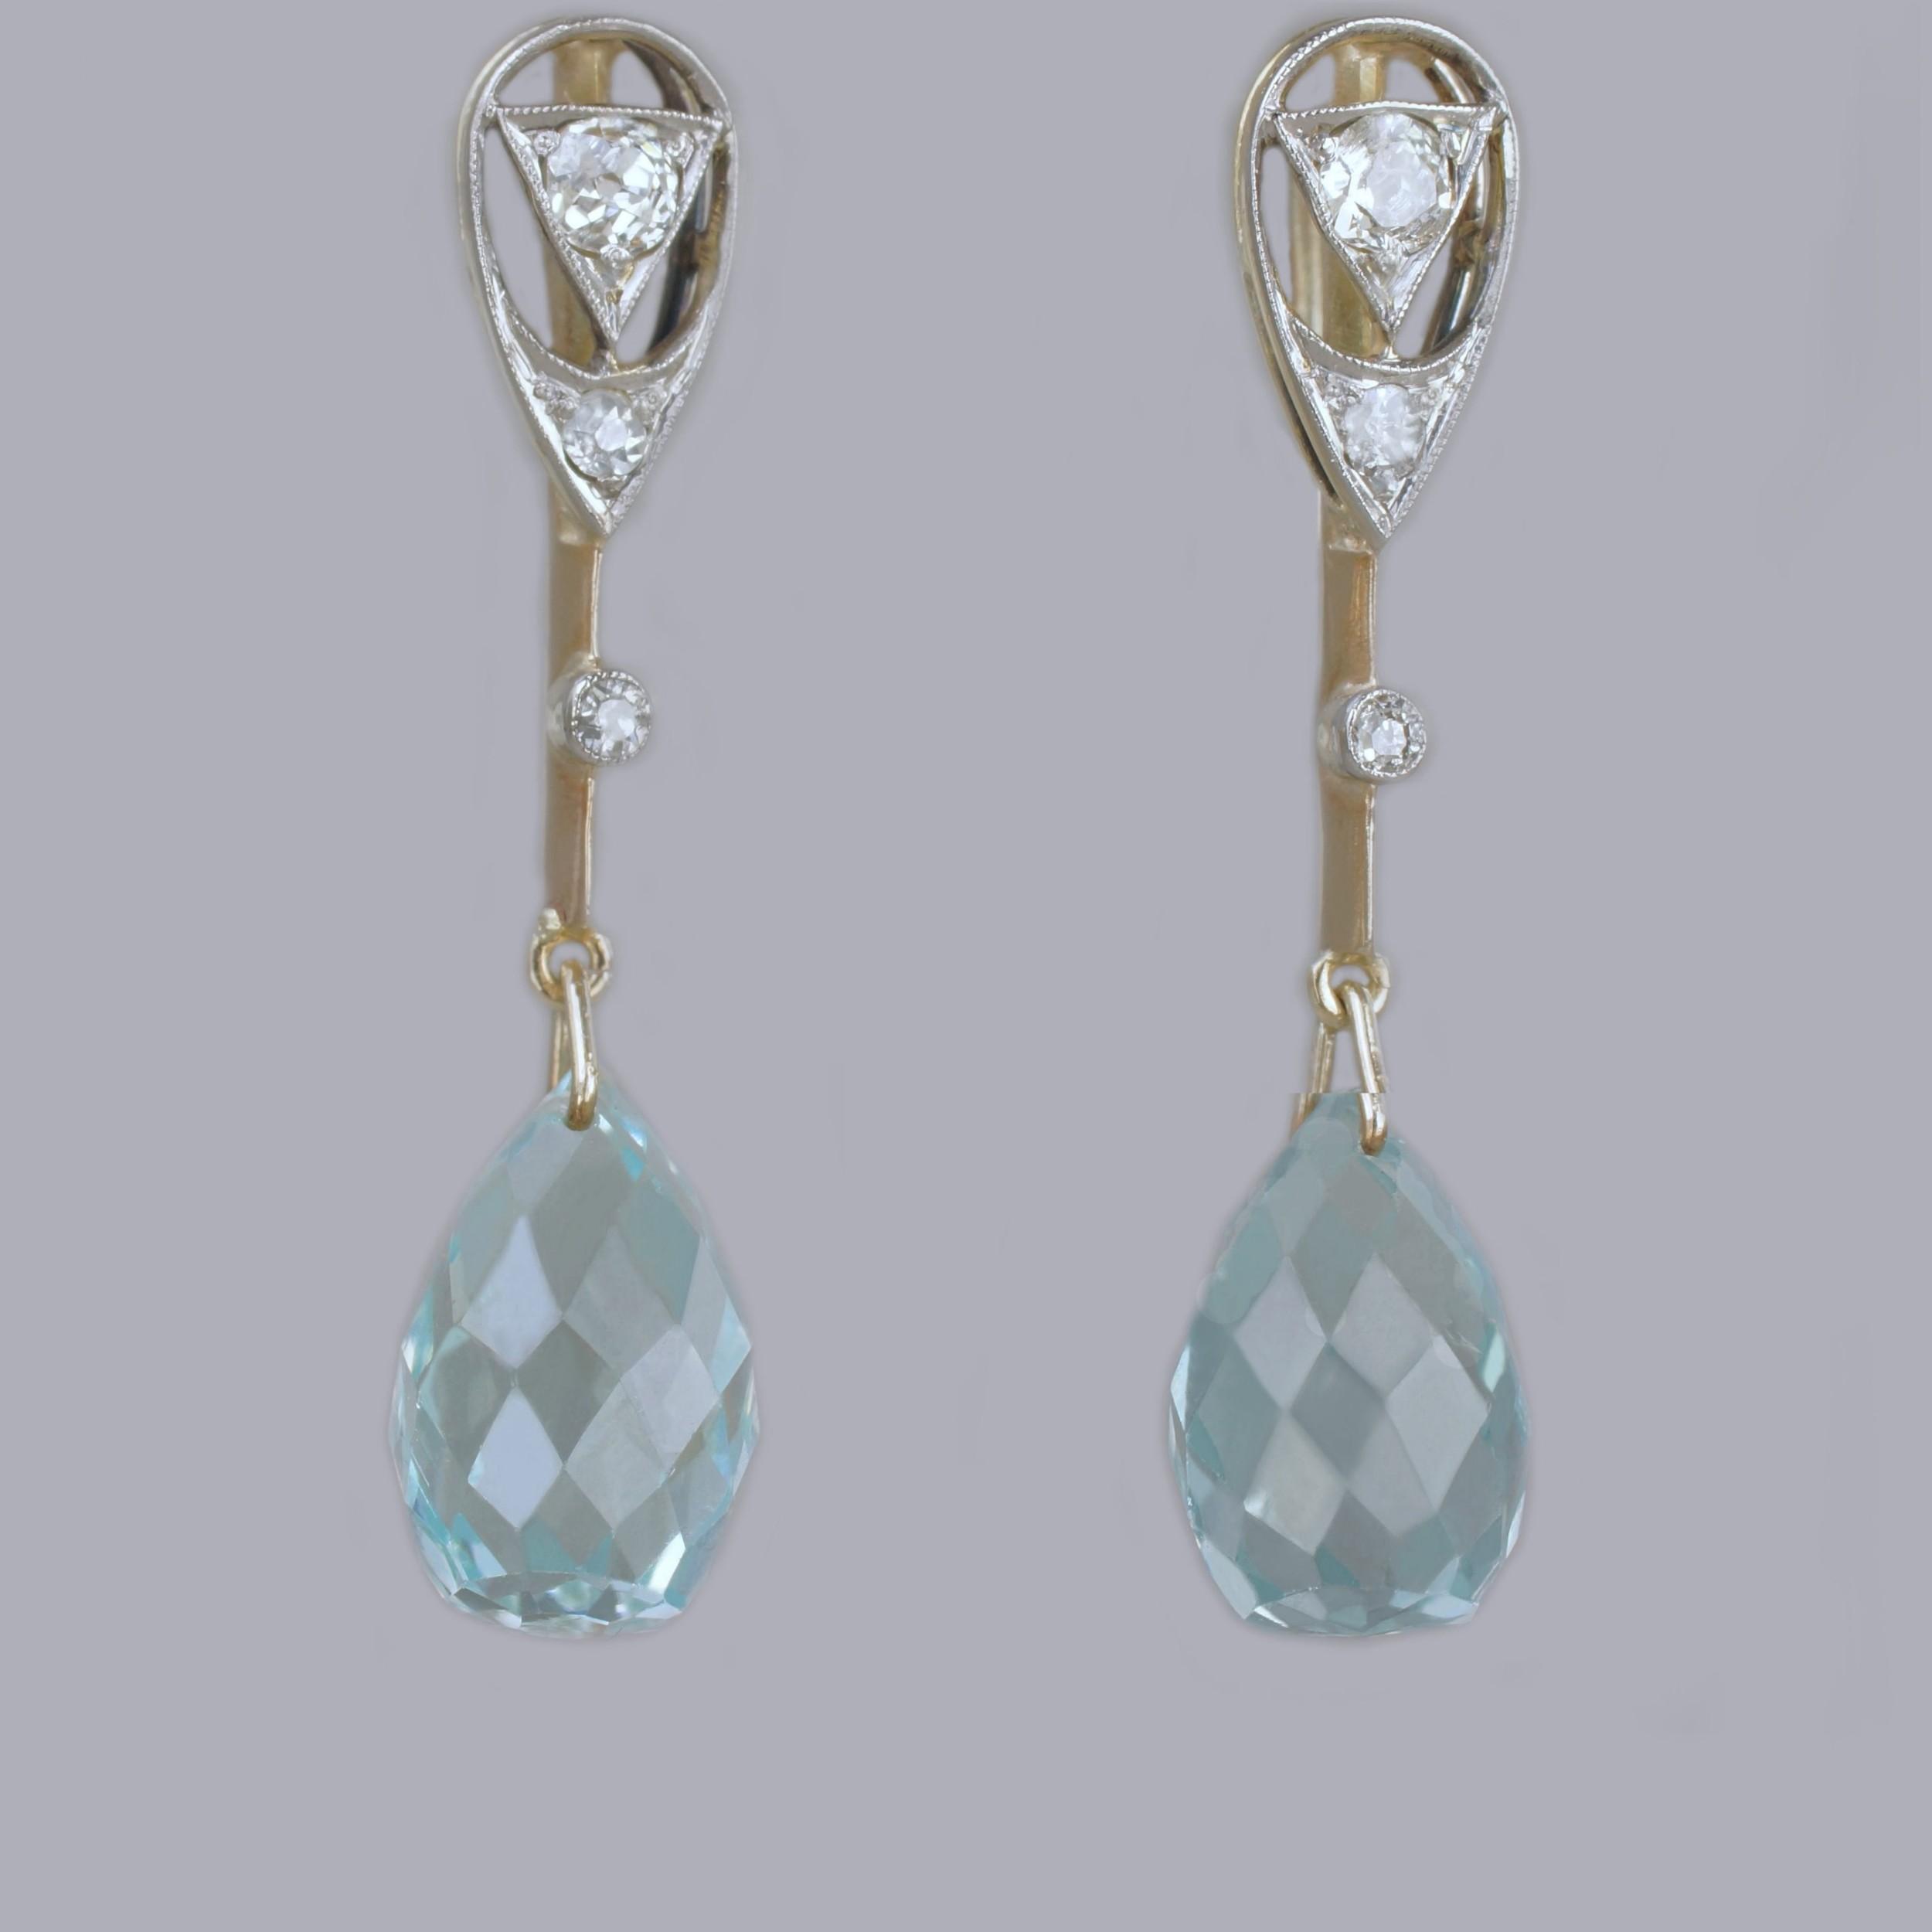 aquamarine old cut diamond edwardian drop earrings antique 18ct gold dangle earrings